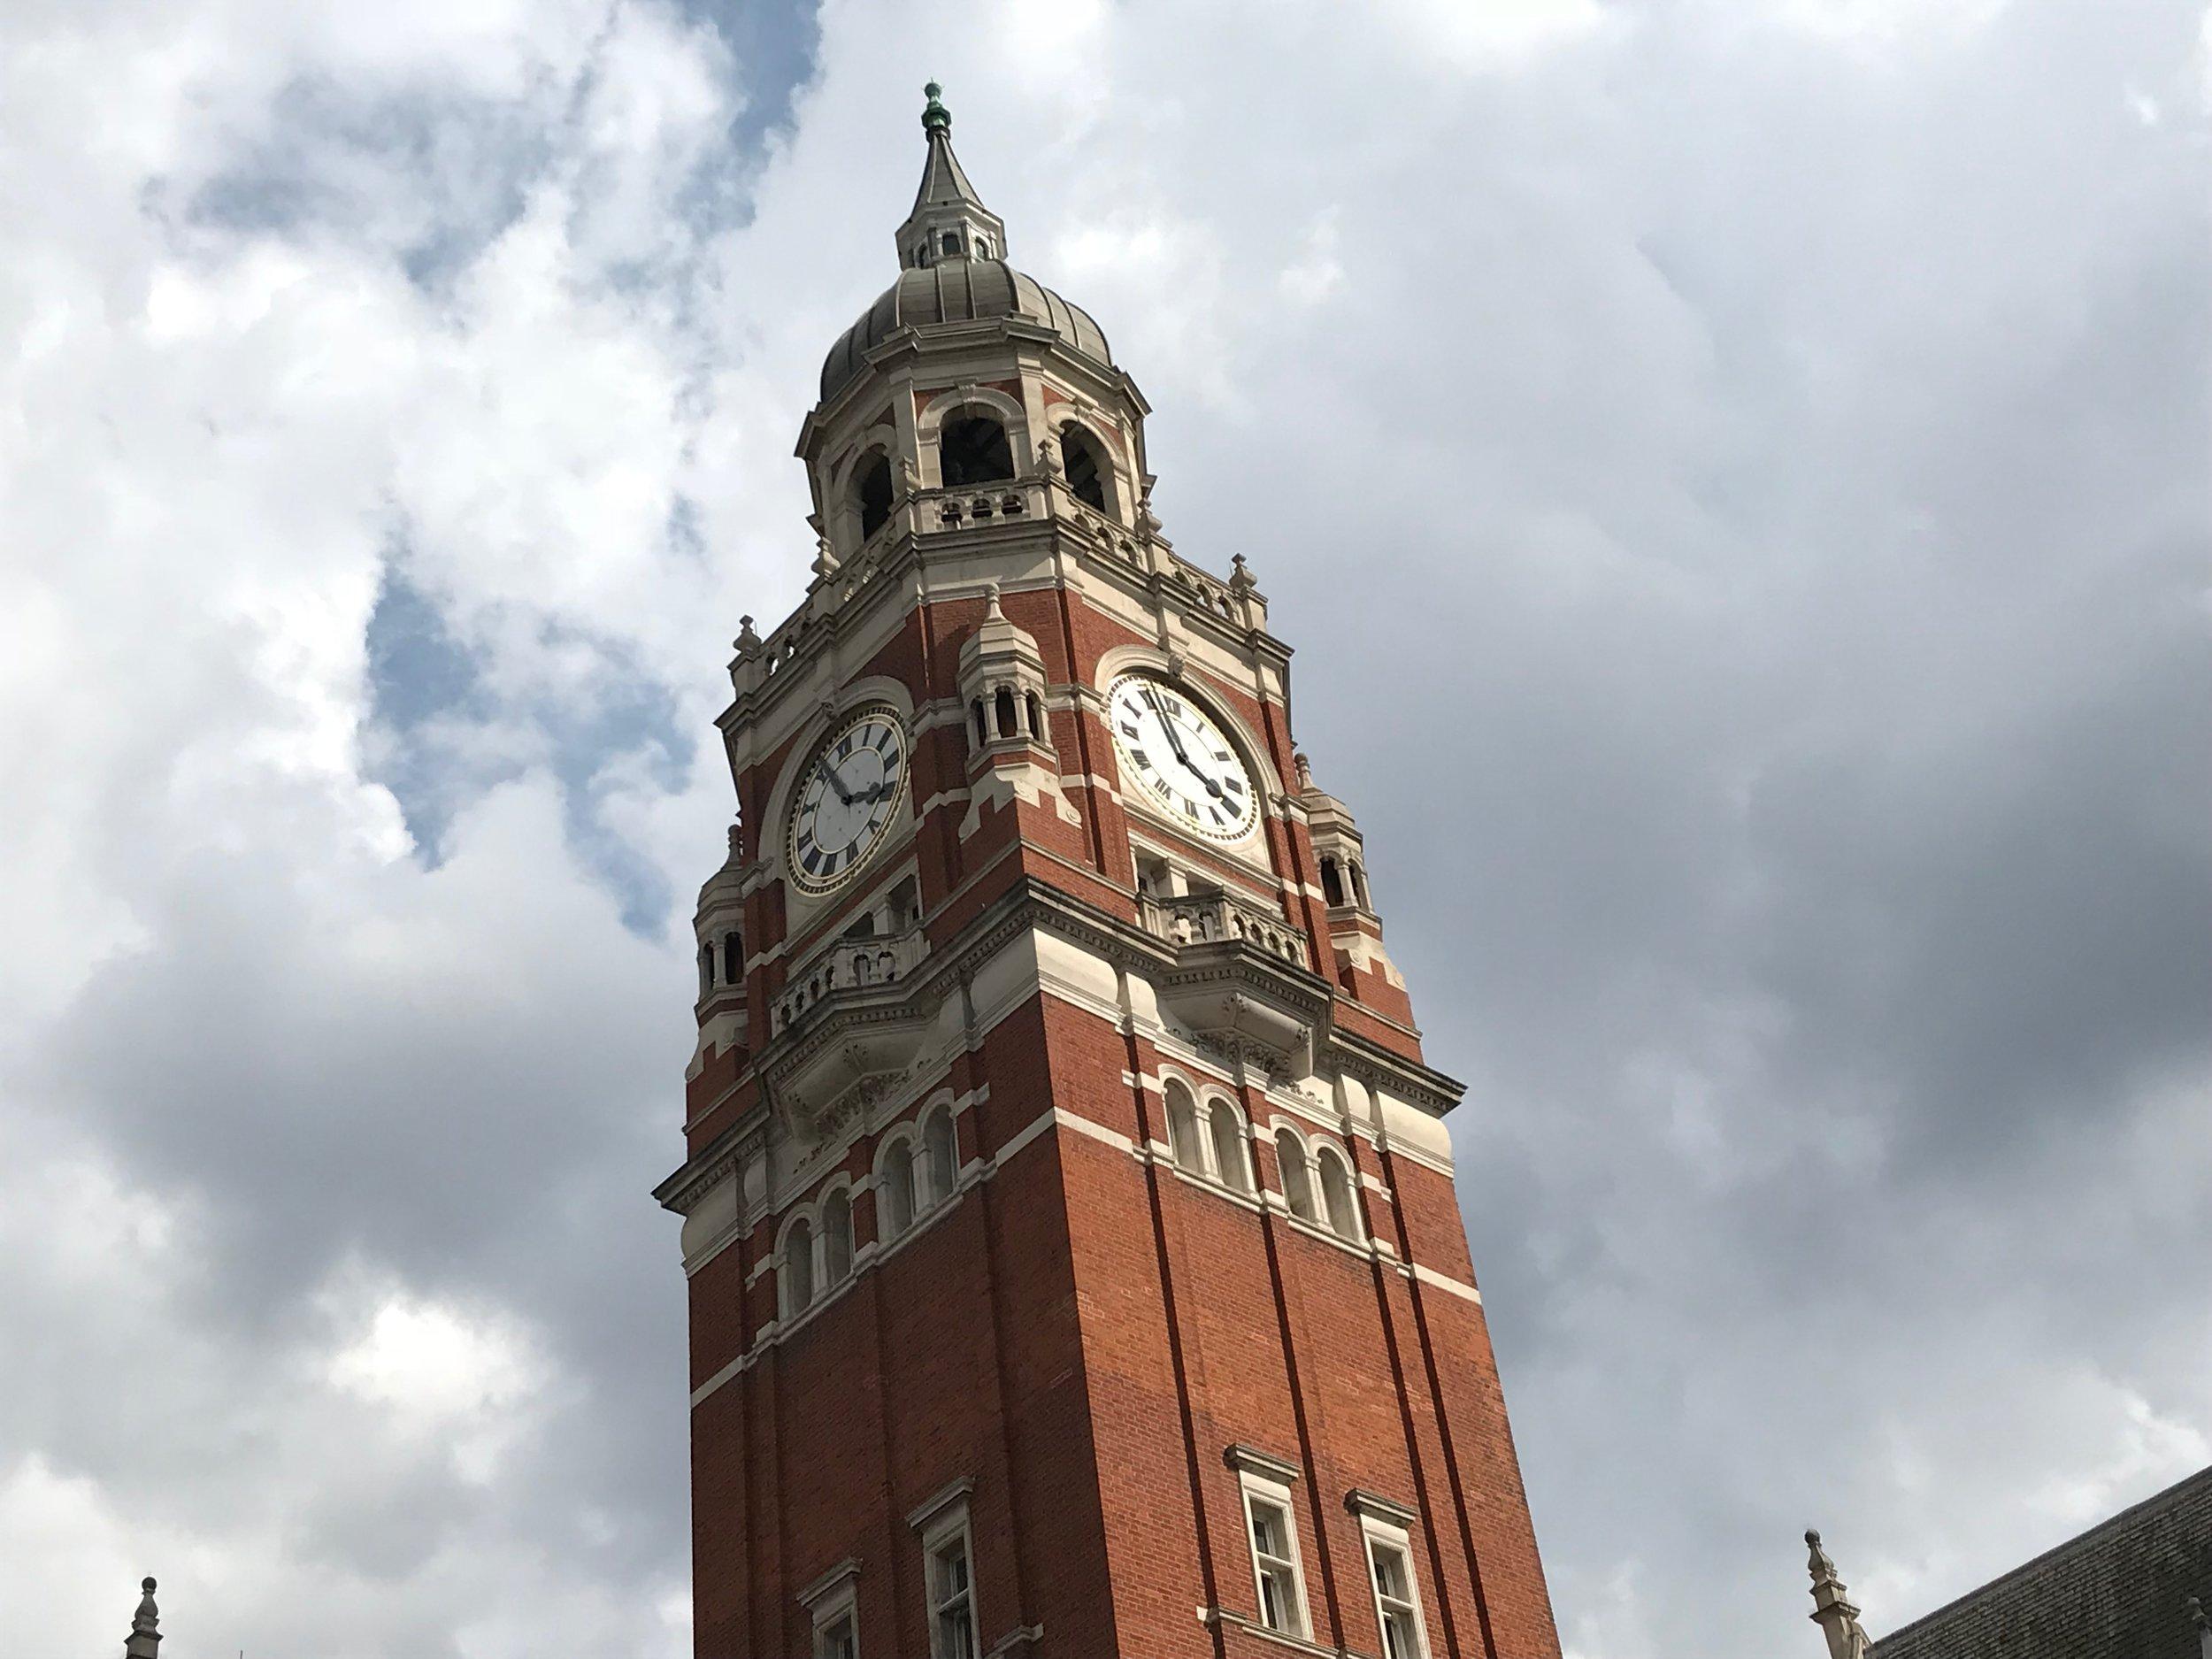 croydon clock tower south london club